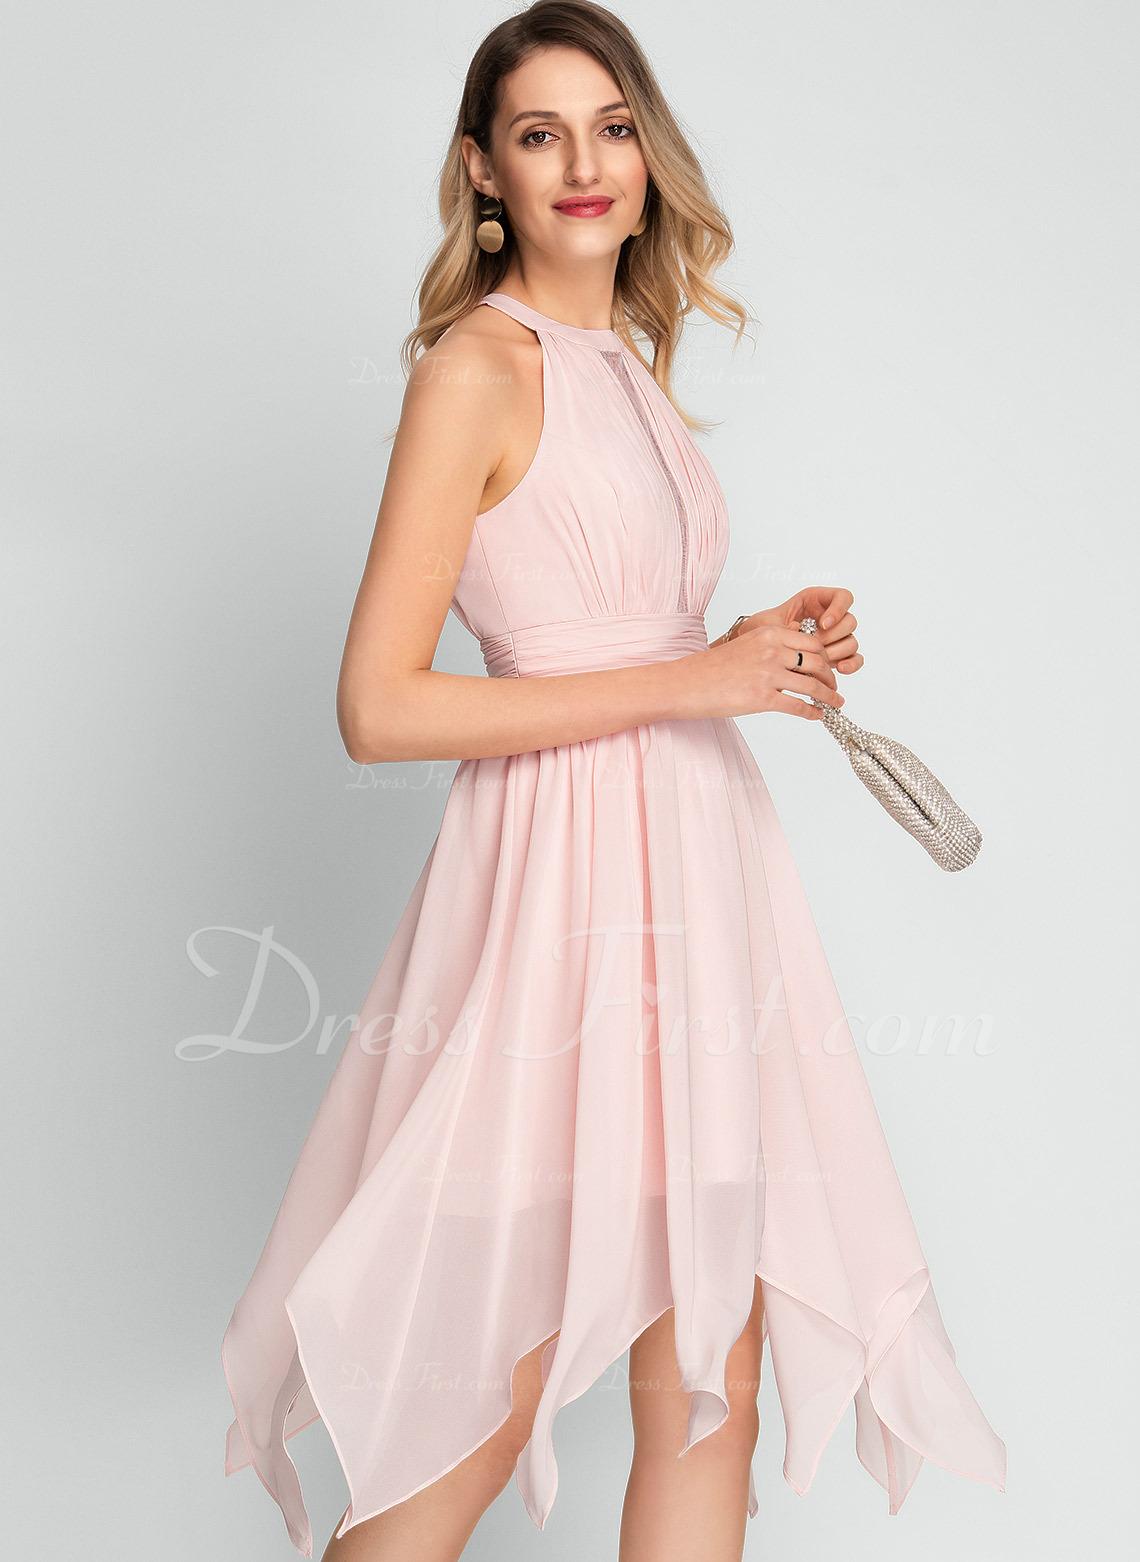 A-Line Scoop Neck Asymmetrical Chiffon Cocktail Dress